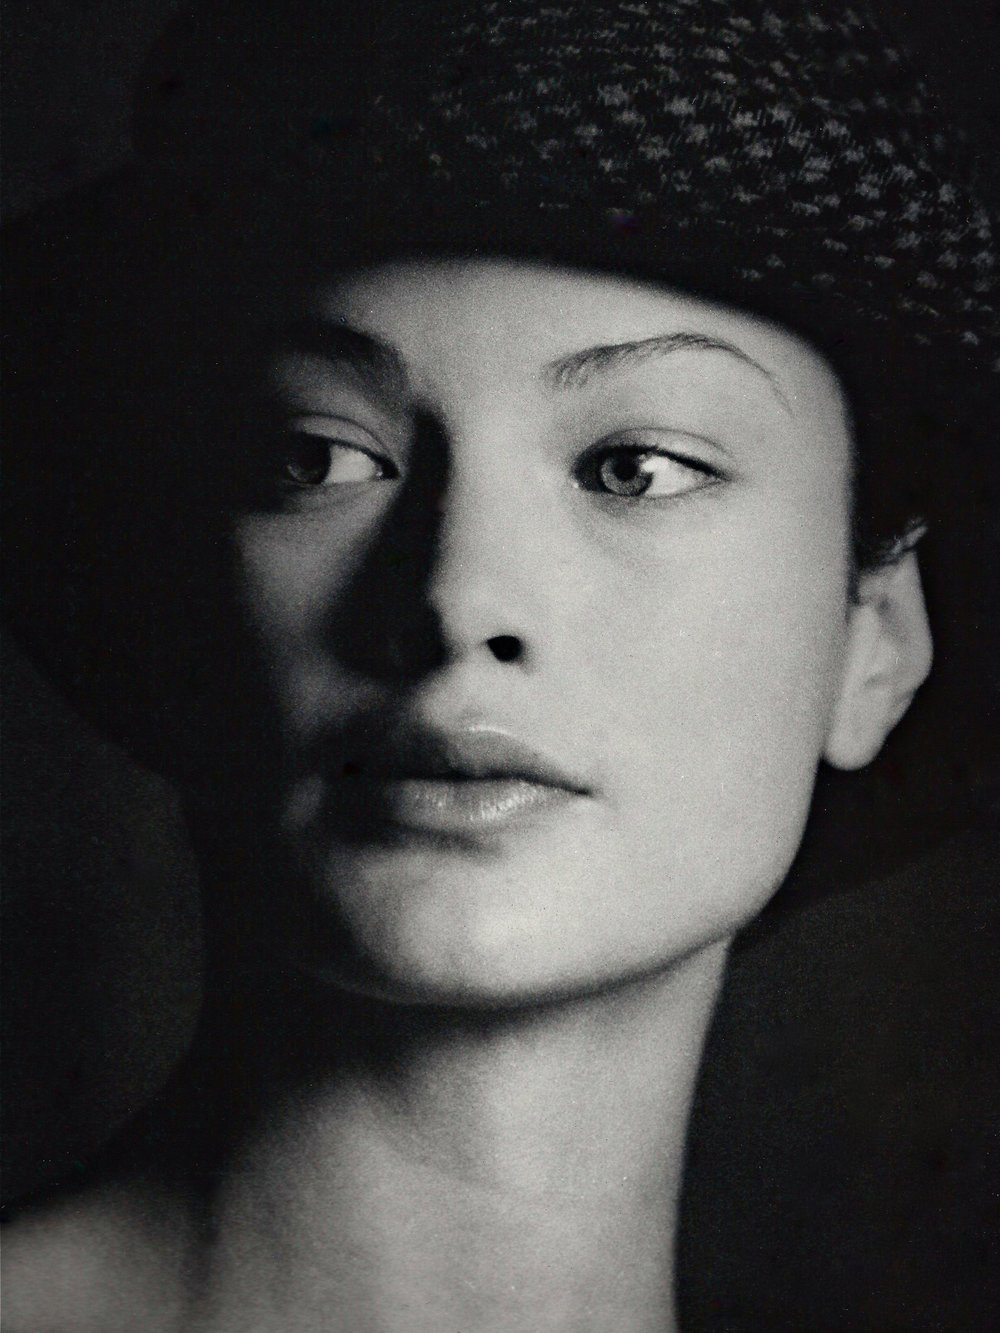 Model and actress Carolyn Murhpy.